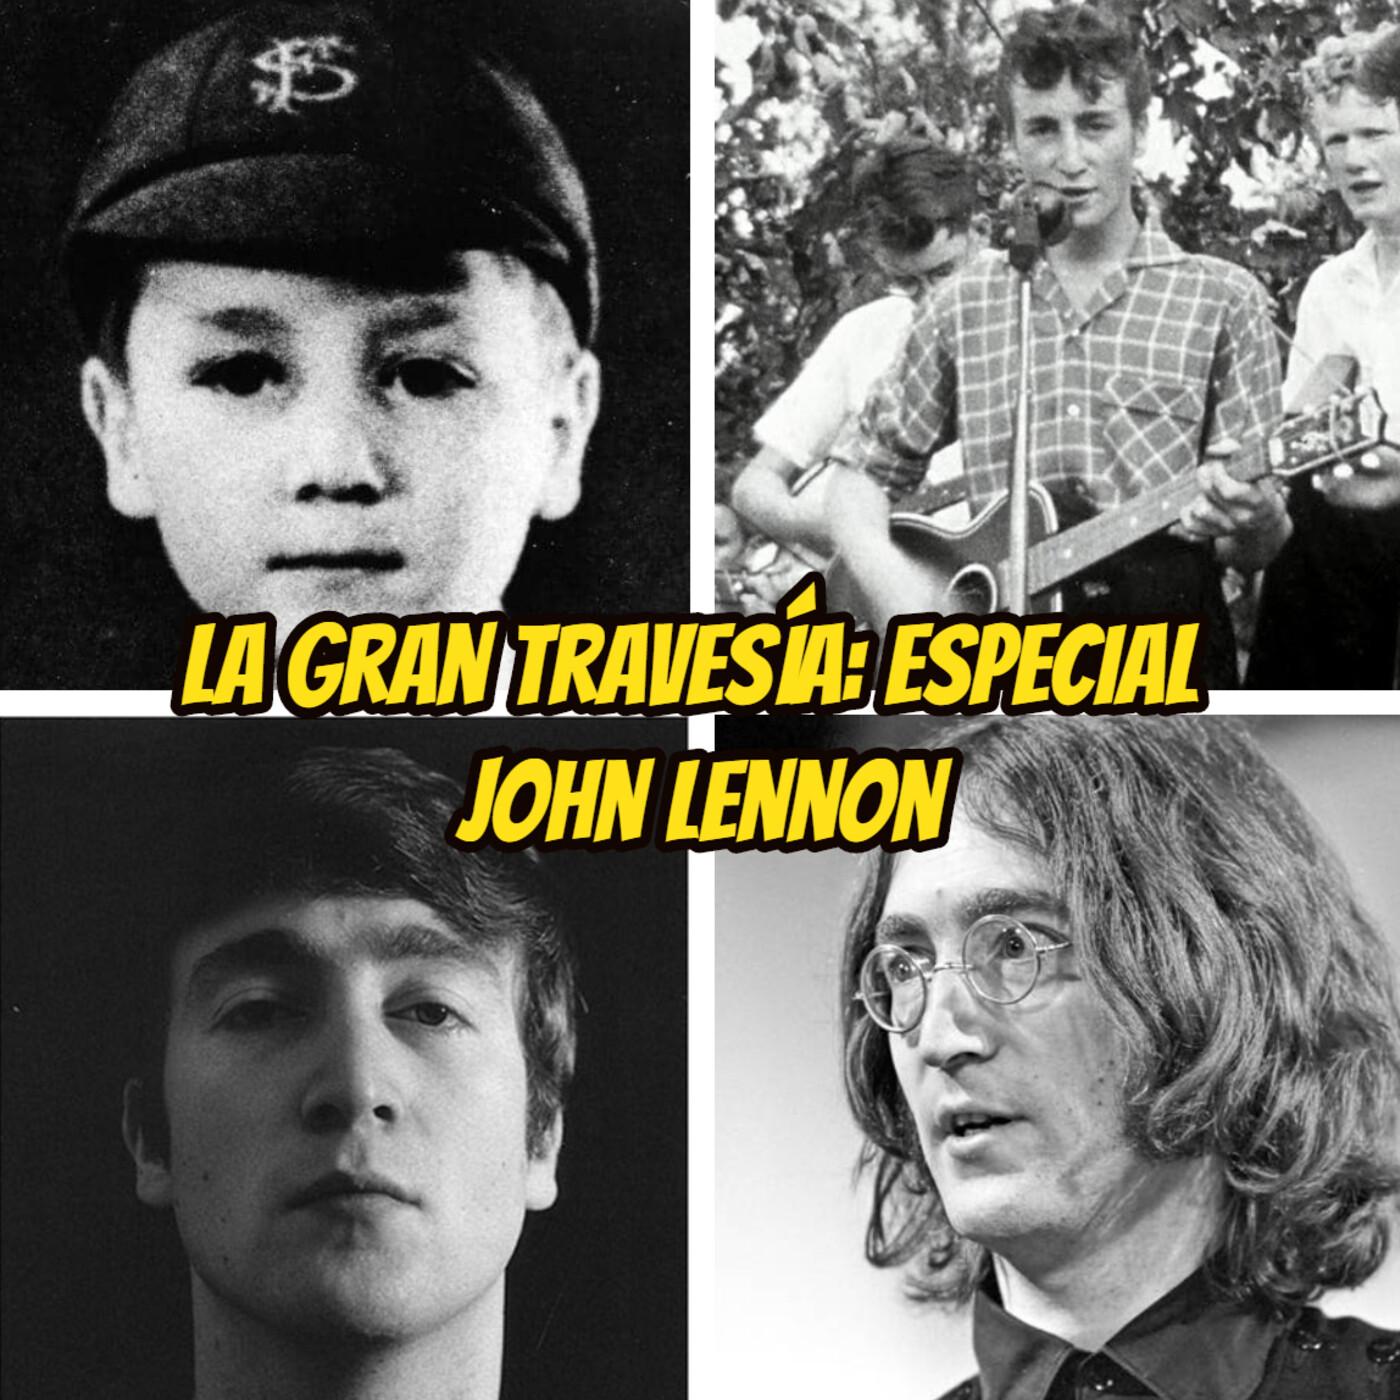 La Gran Travesía: Imagina John Lennon. 80 años